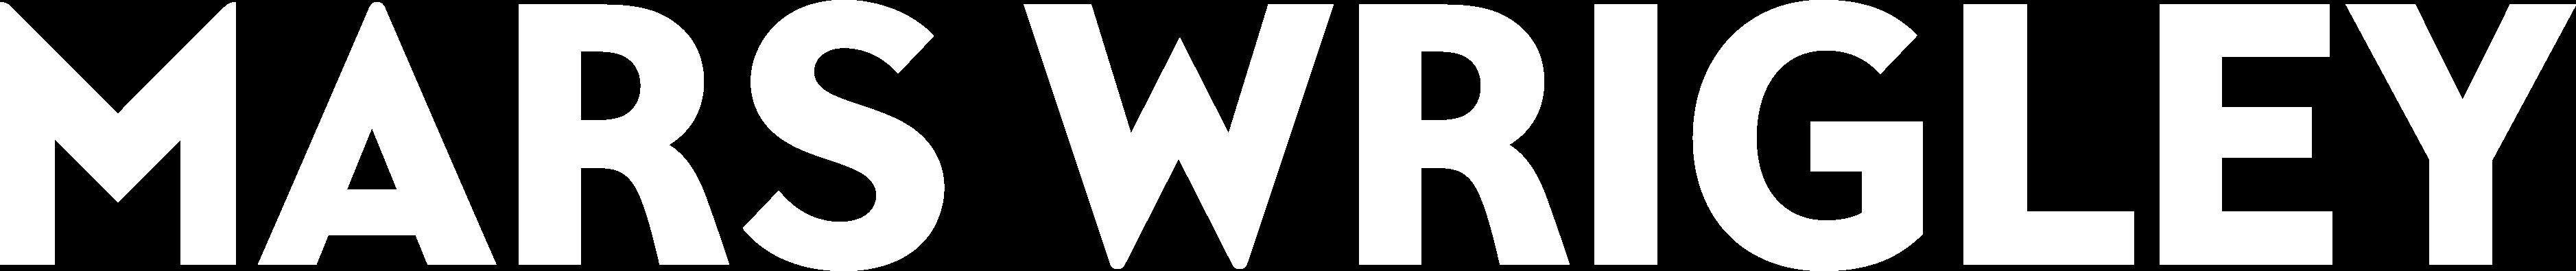 mars wrigley logo white